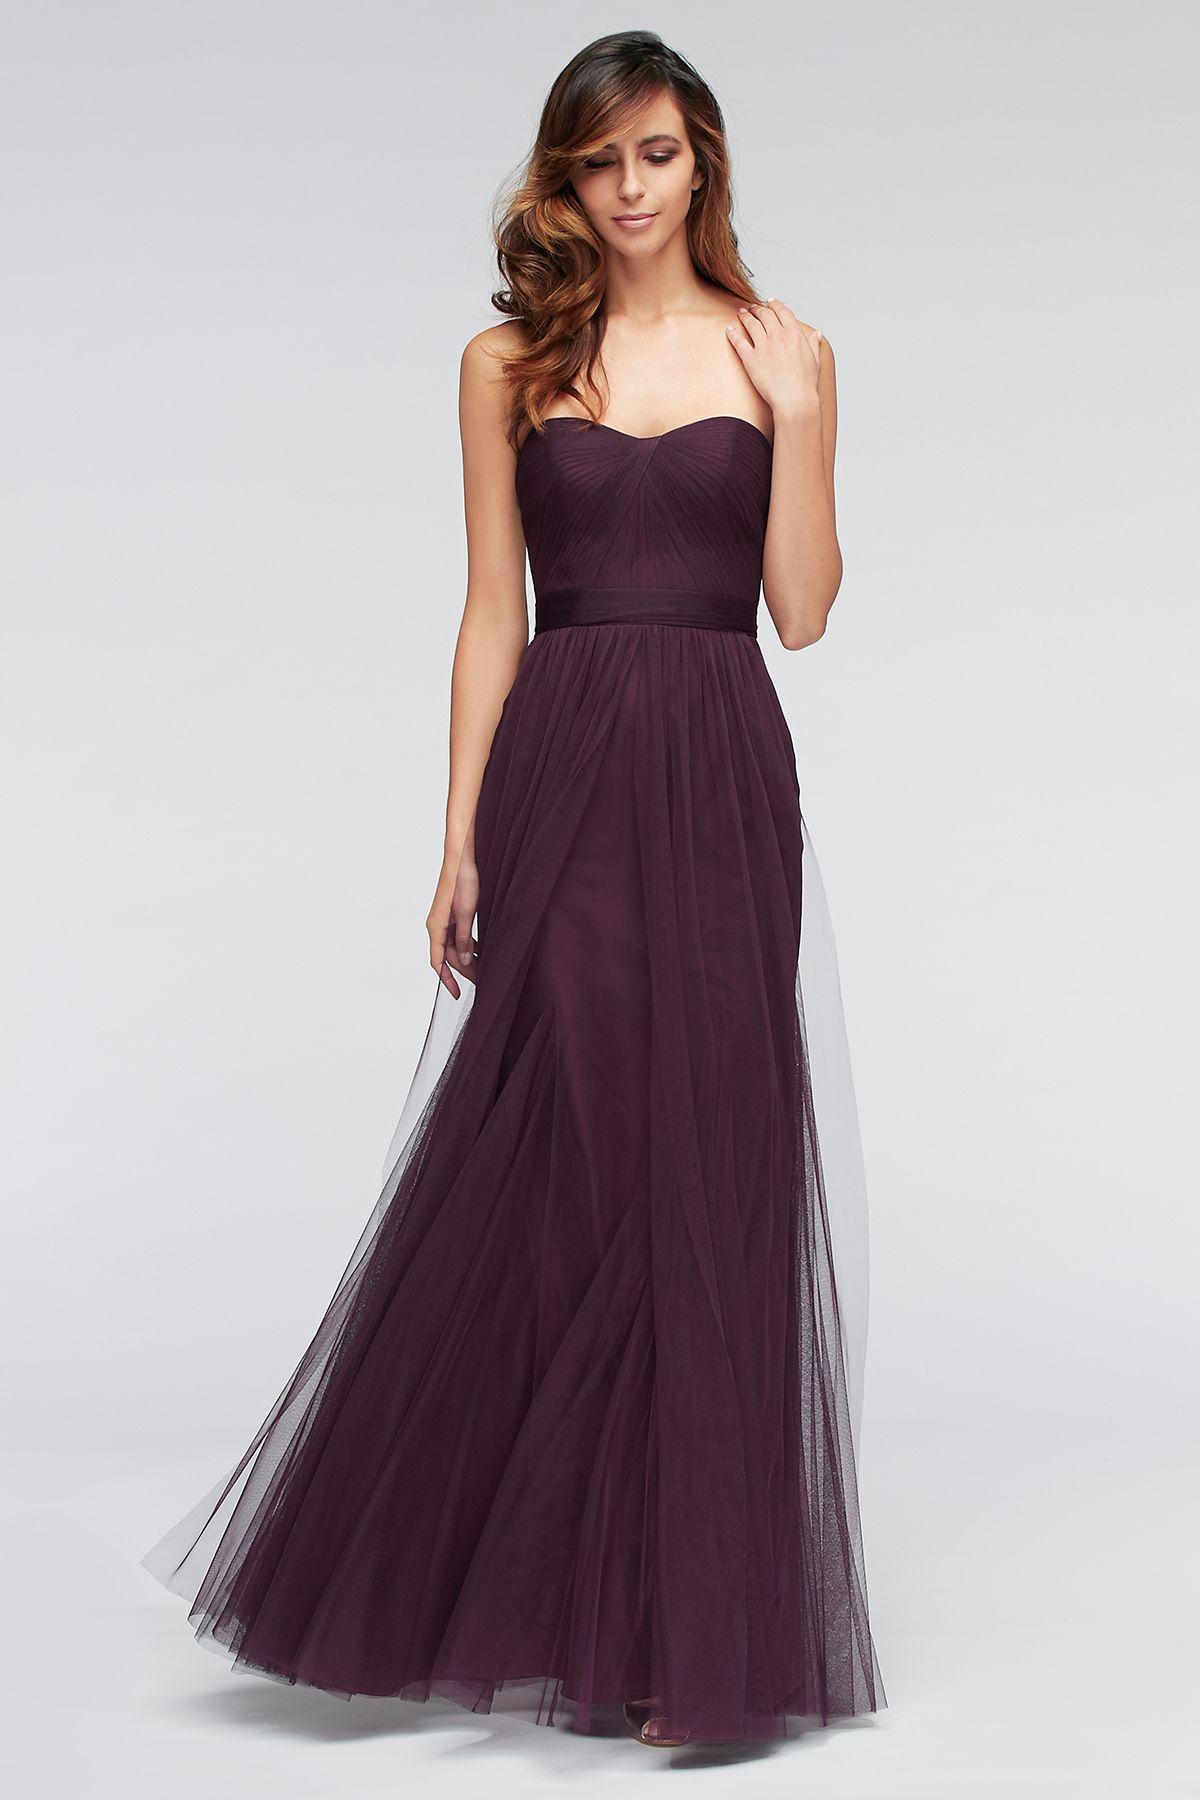 Strapless dark grey bridesmaids dress annabelle dress by jenny watterswtoo bridesmaids dress 1307 in eggplant ombrellifo Images